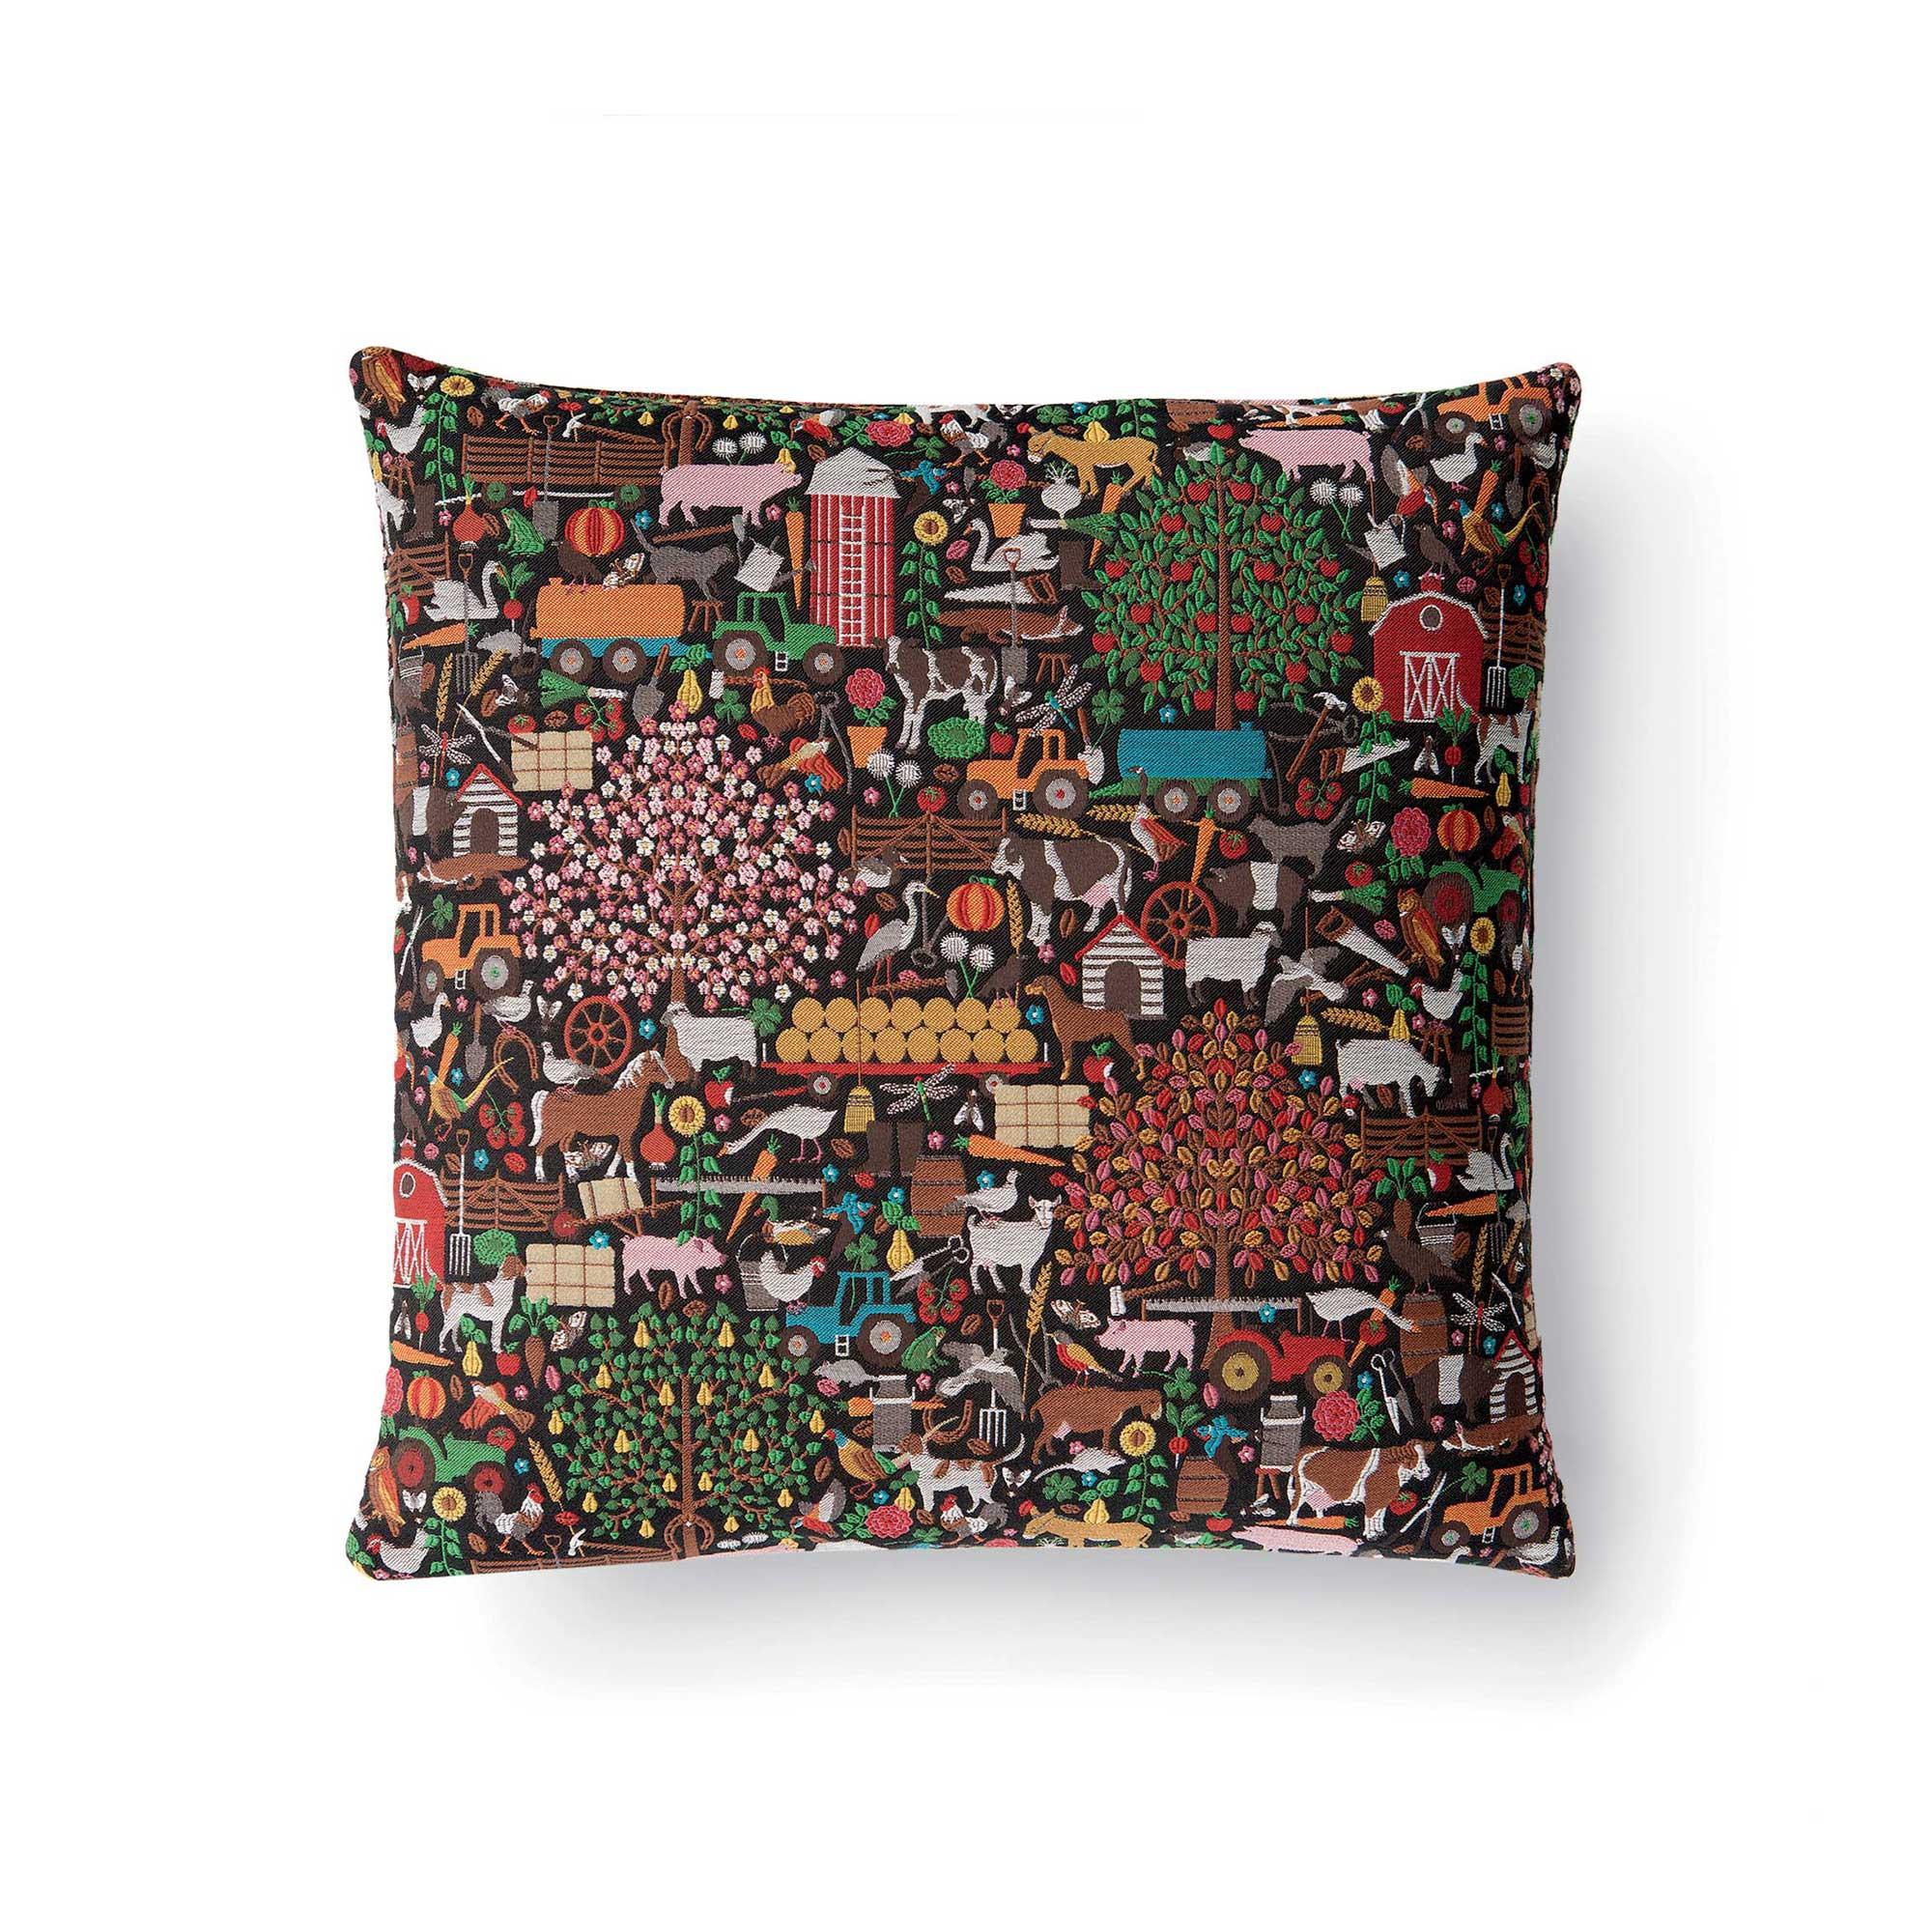 Studio-Job-Maharam-Bavaria-pillow1